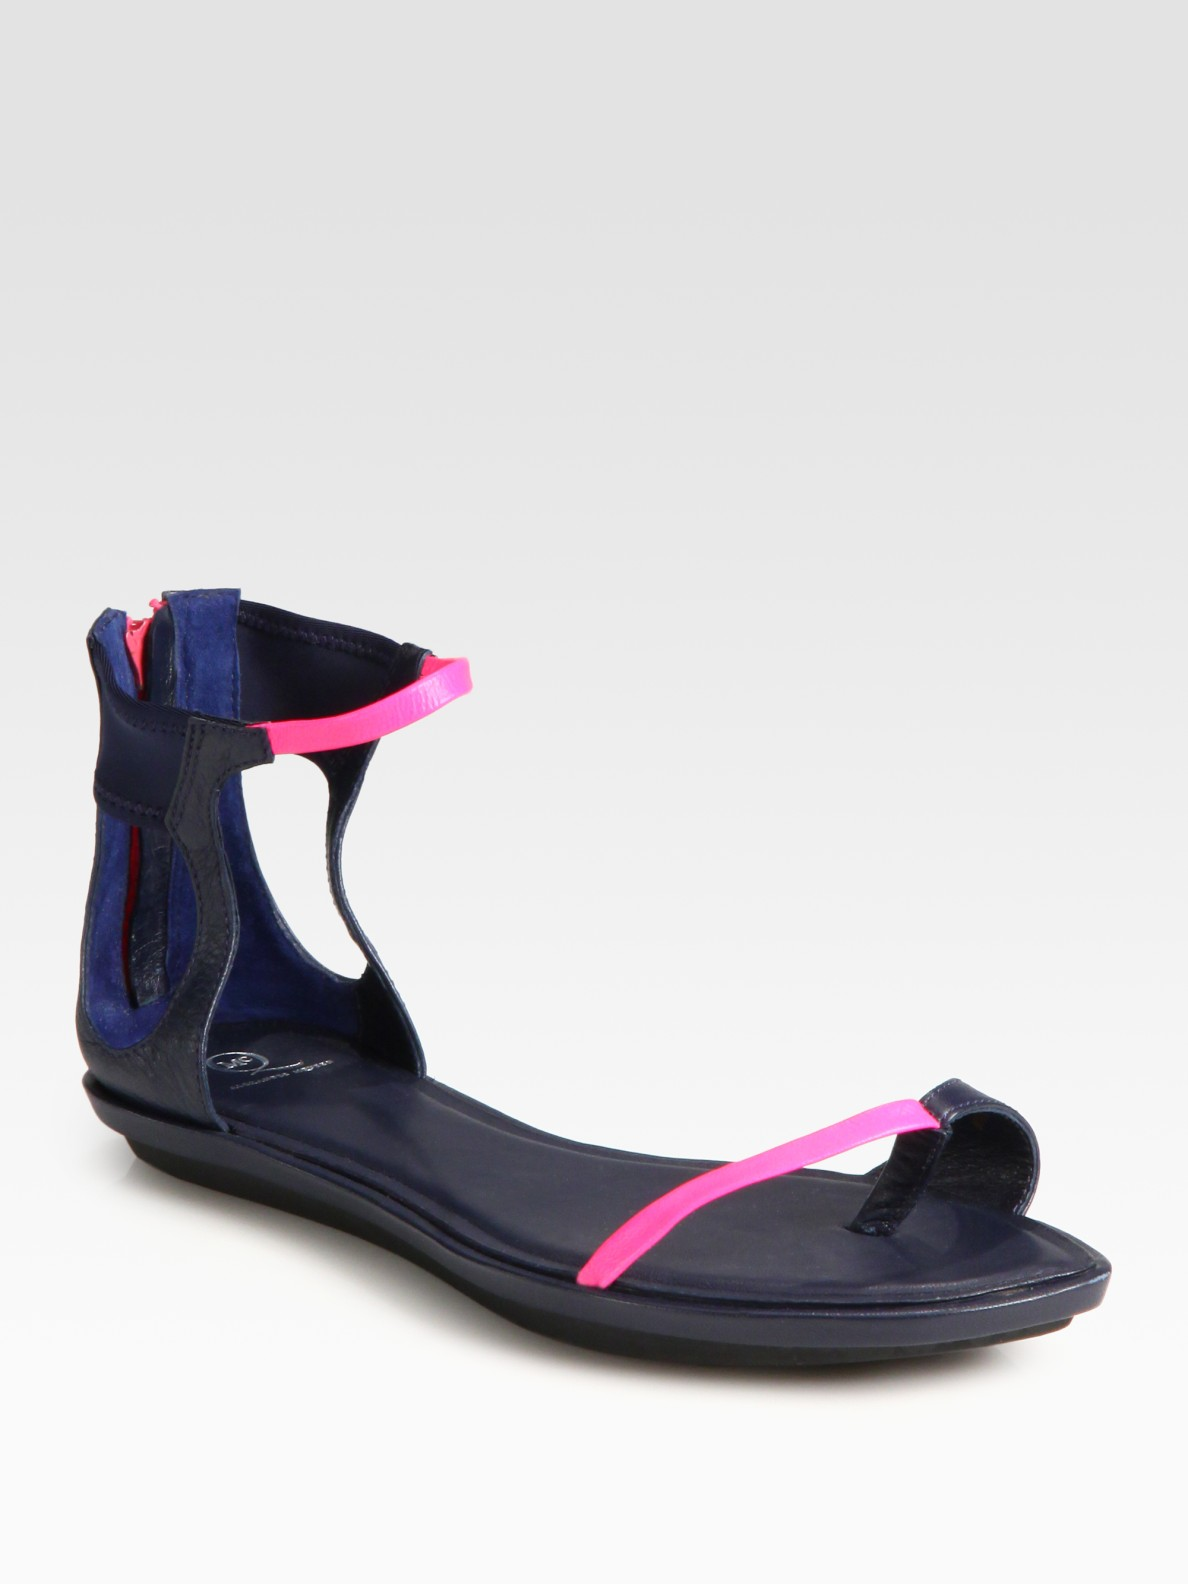 Sandale Entredoigt Alexander Mcqueen yDht21ThX0